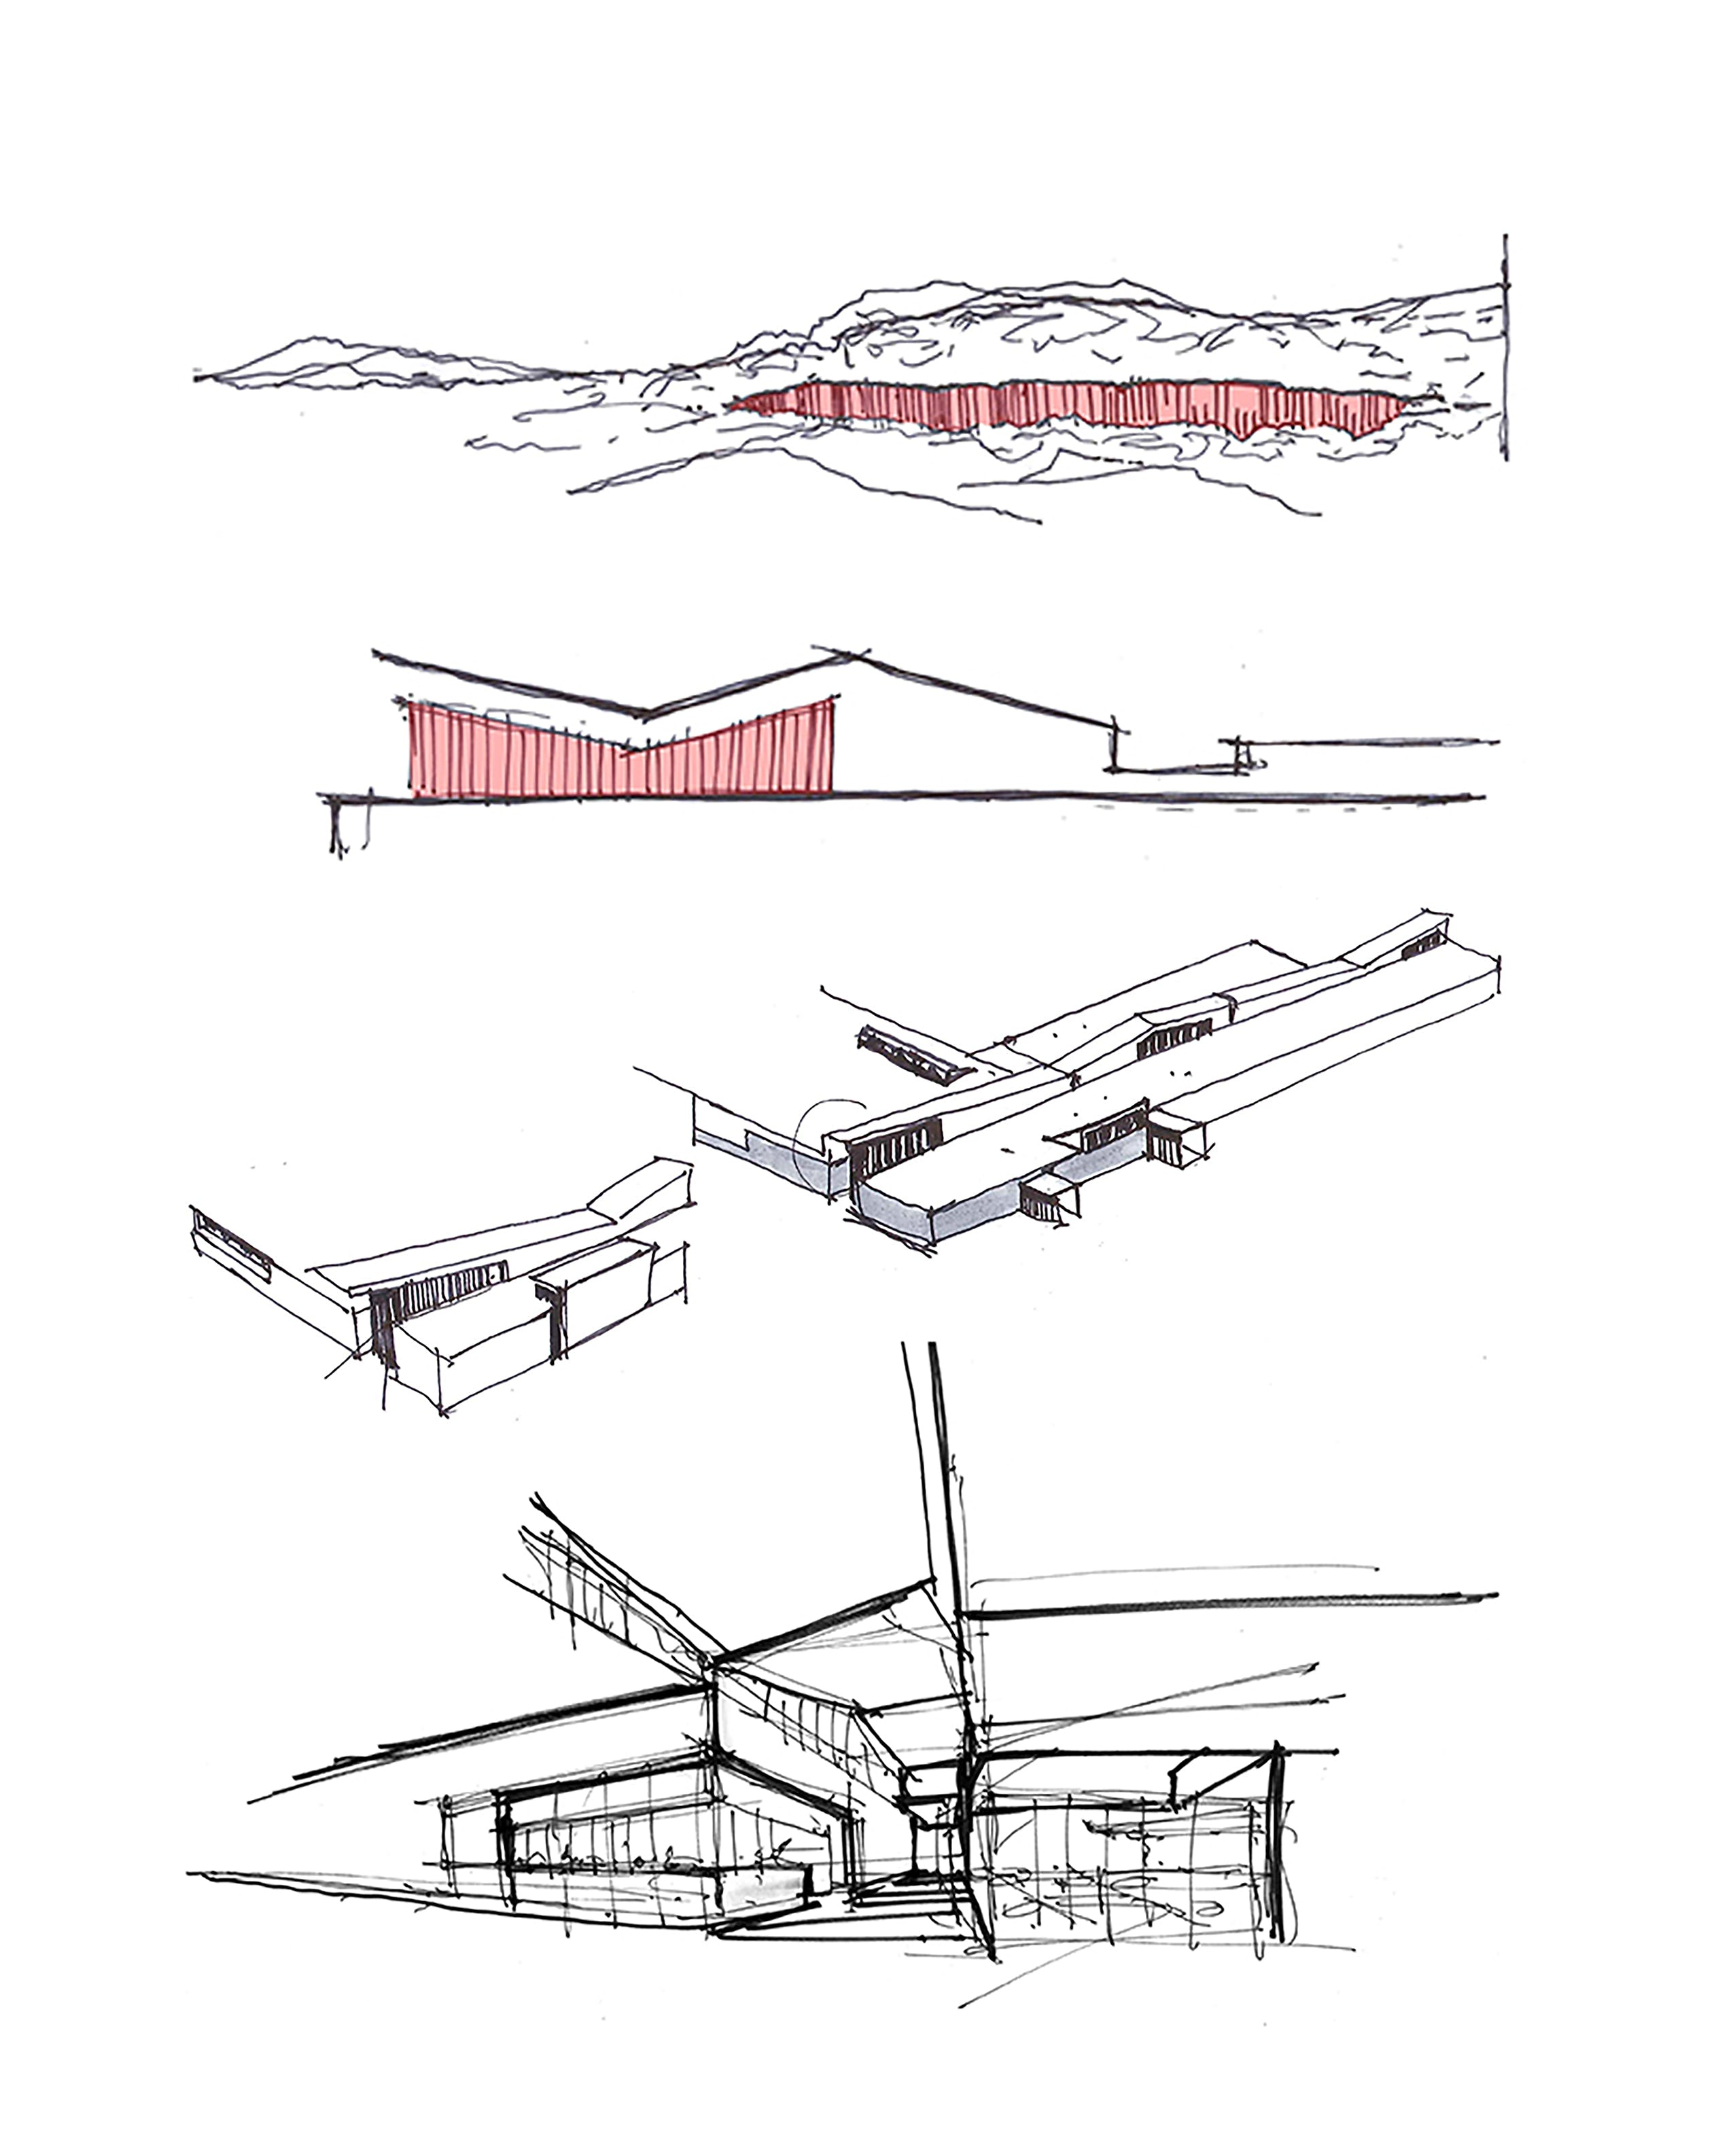 Modus studio flippin elementary sketches